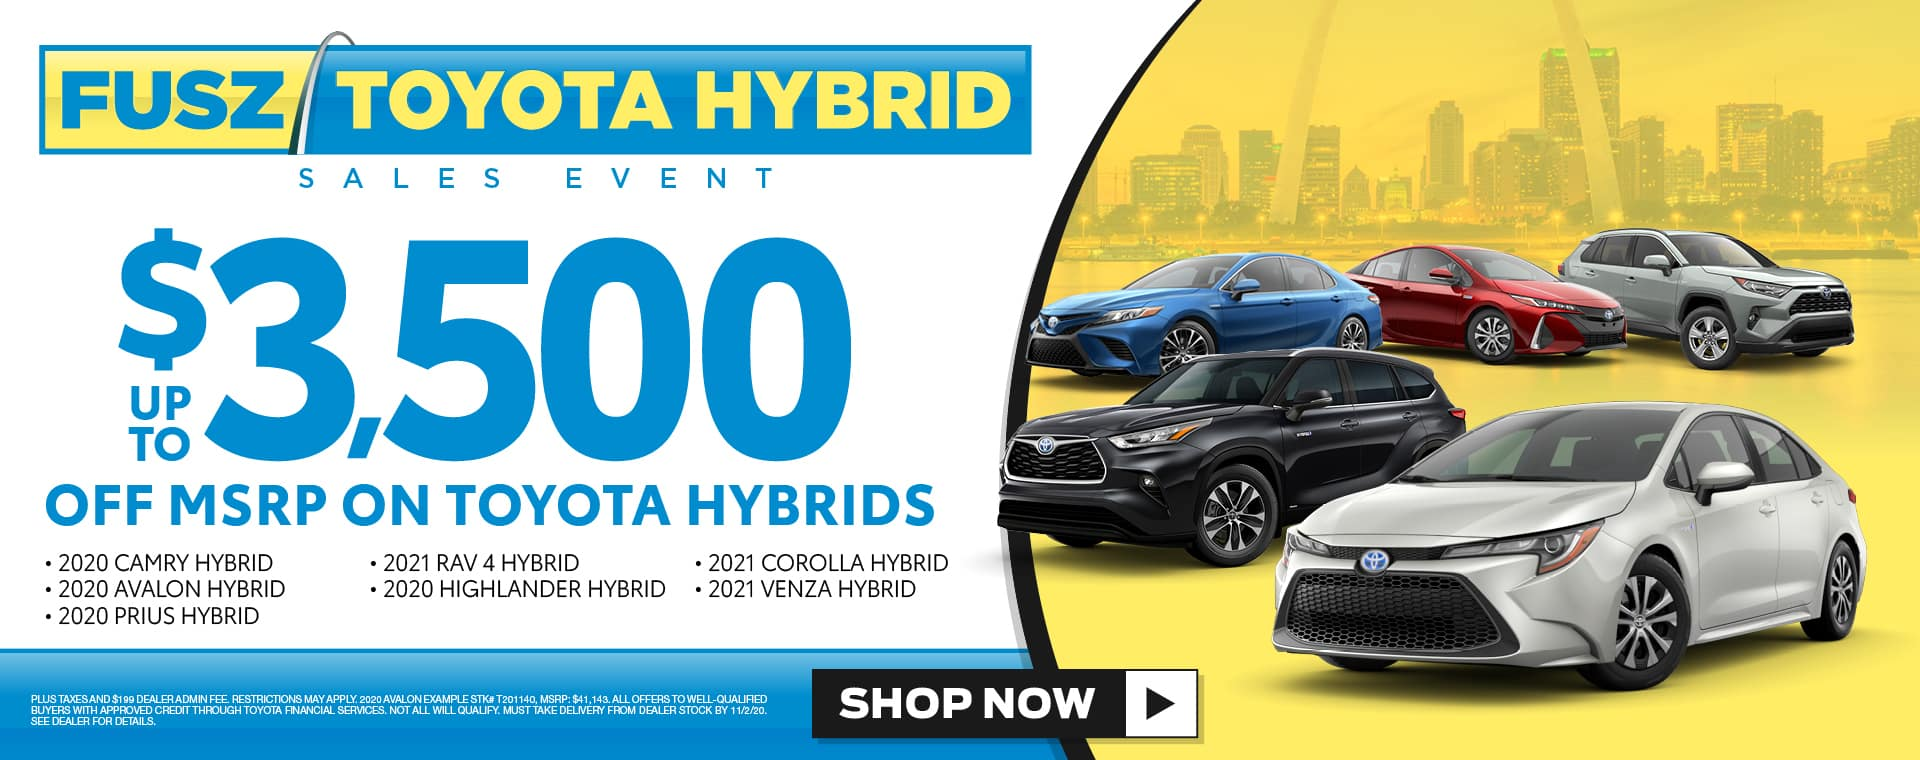 Fusz Toyota Hybrid Sales Event